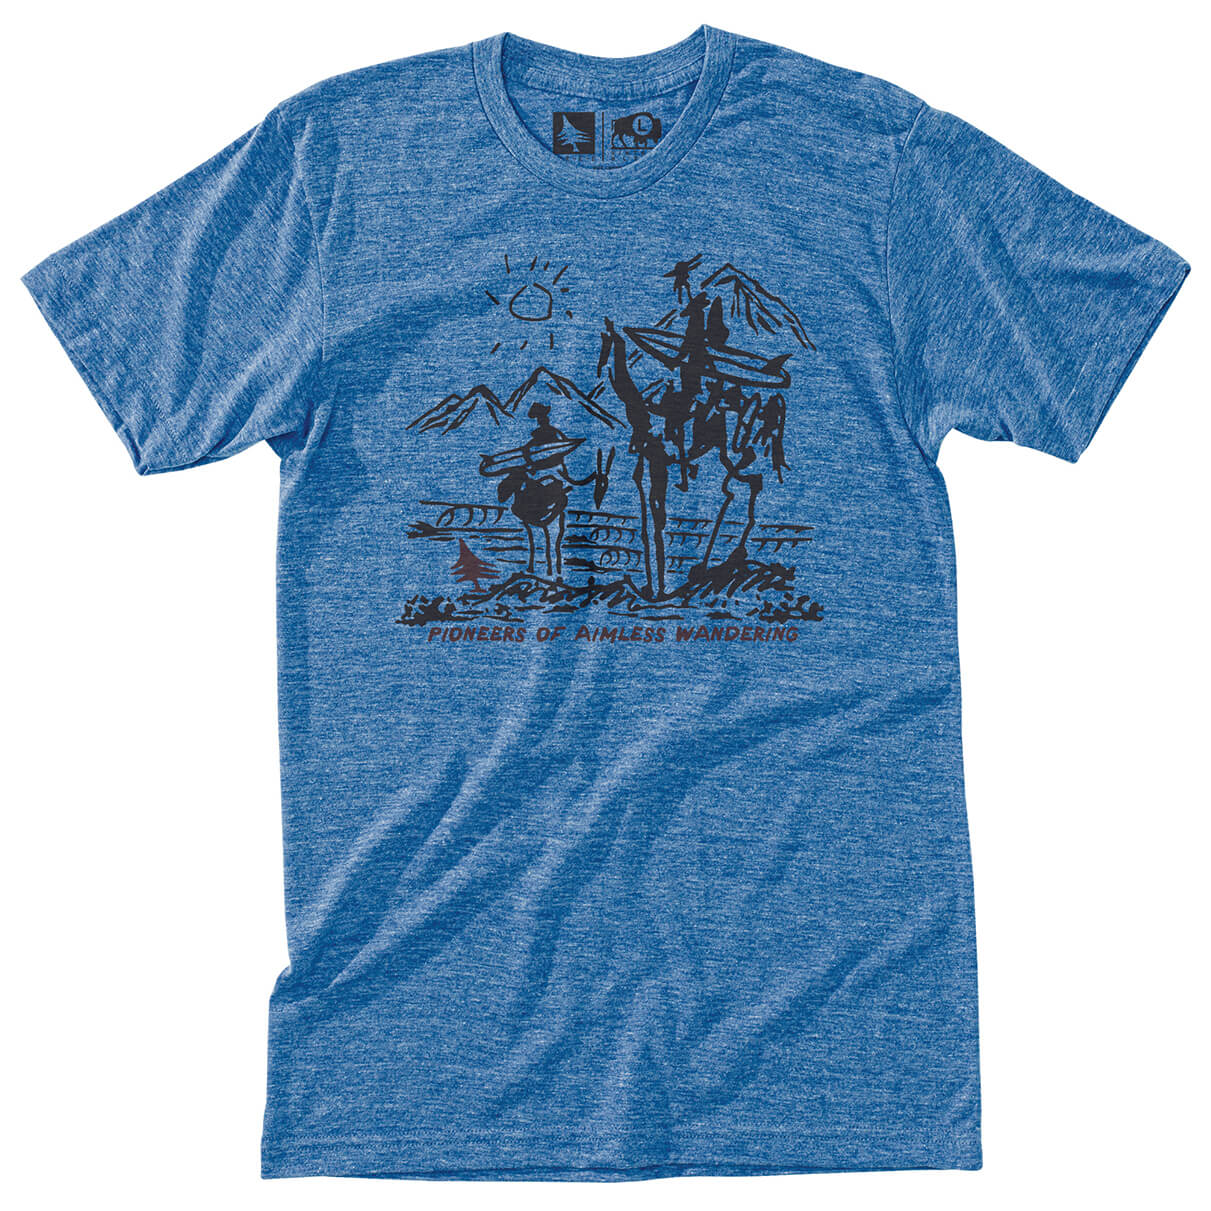 Hippy tree drifter tee t shirt homme achat en ligne for Hippie t shirts australia